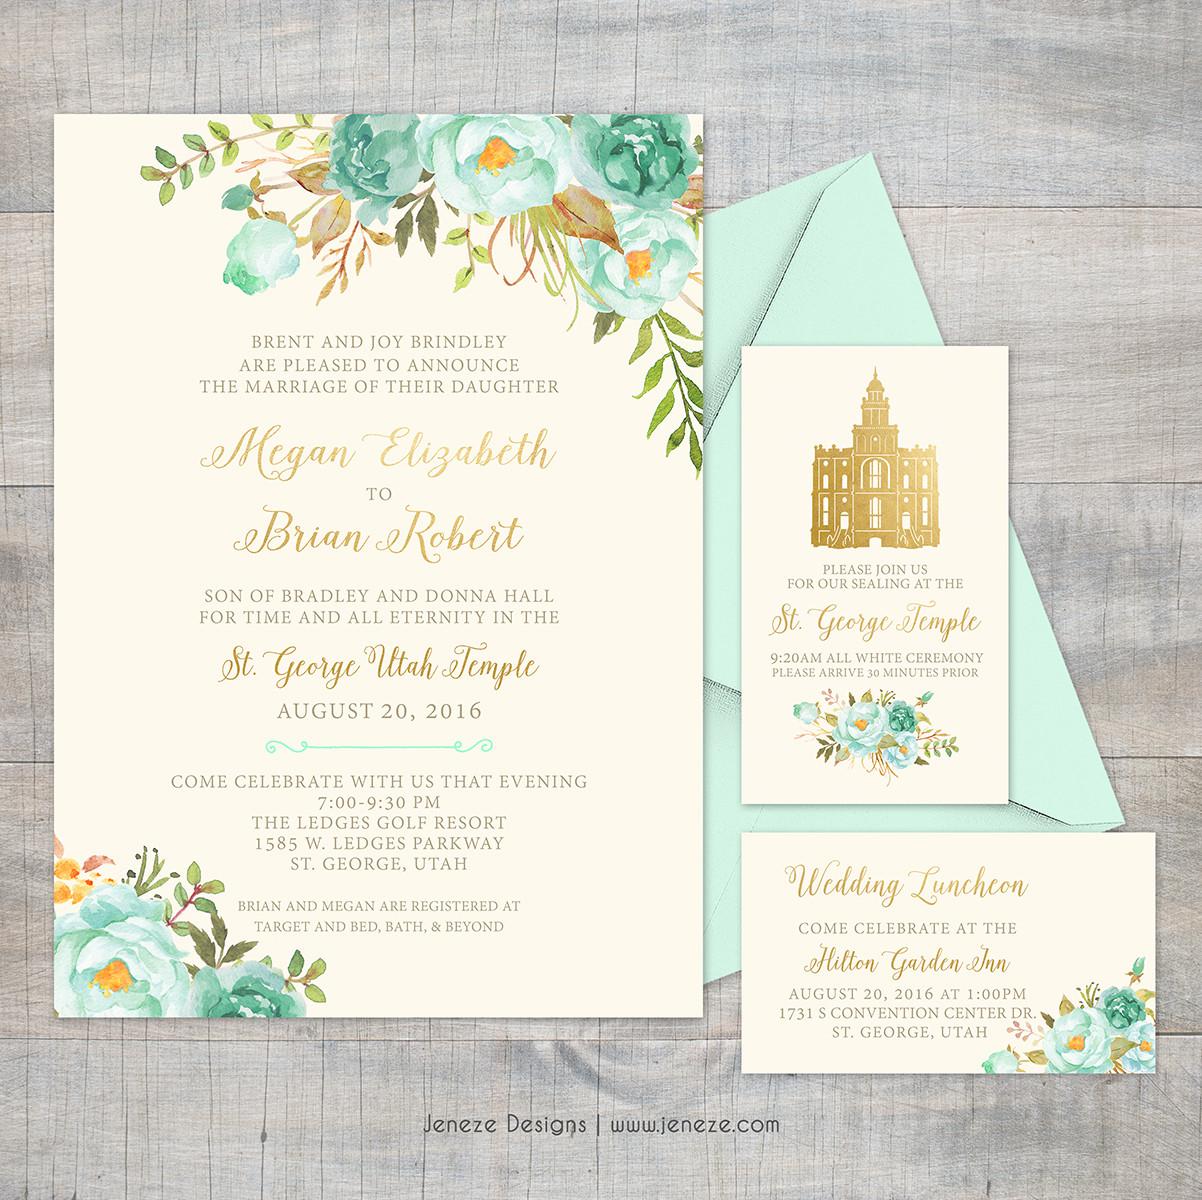 Invitation - Item# CA280   Jeneze Designs Custom Wedding Invitations